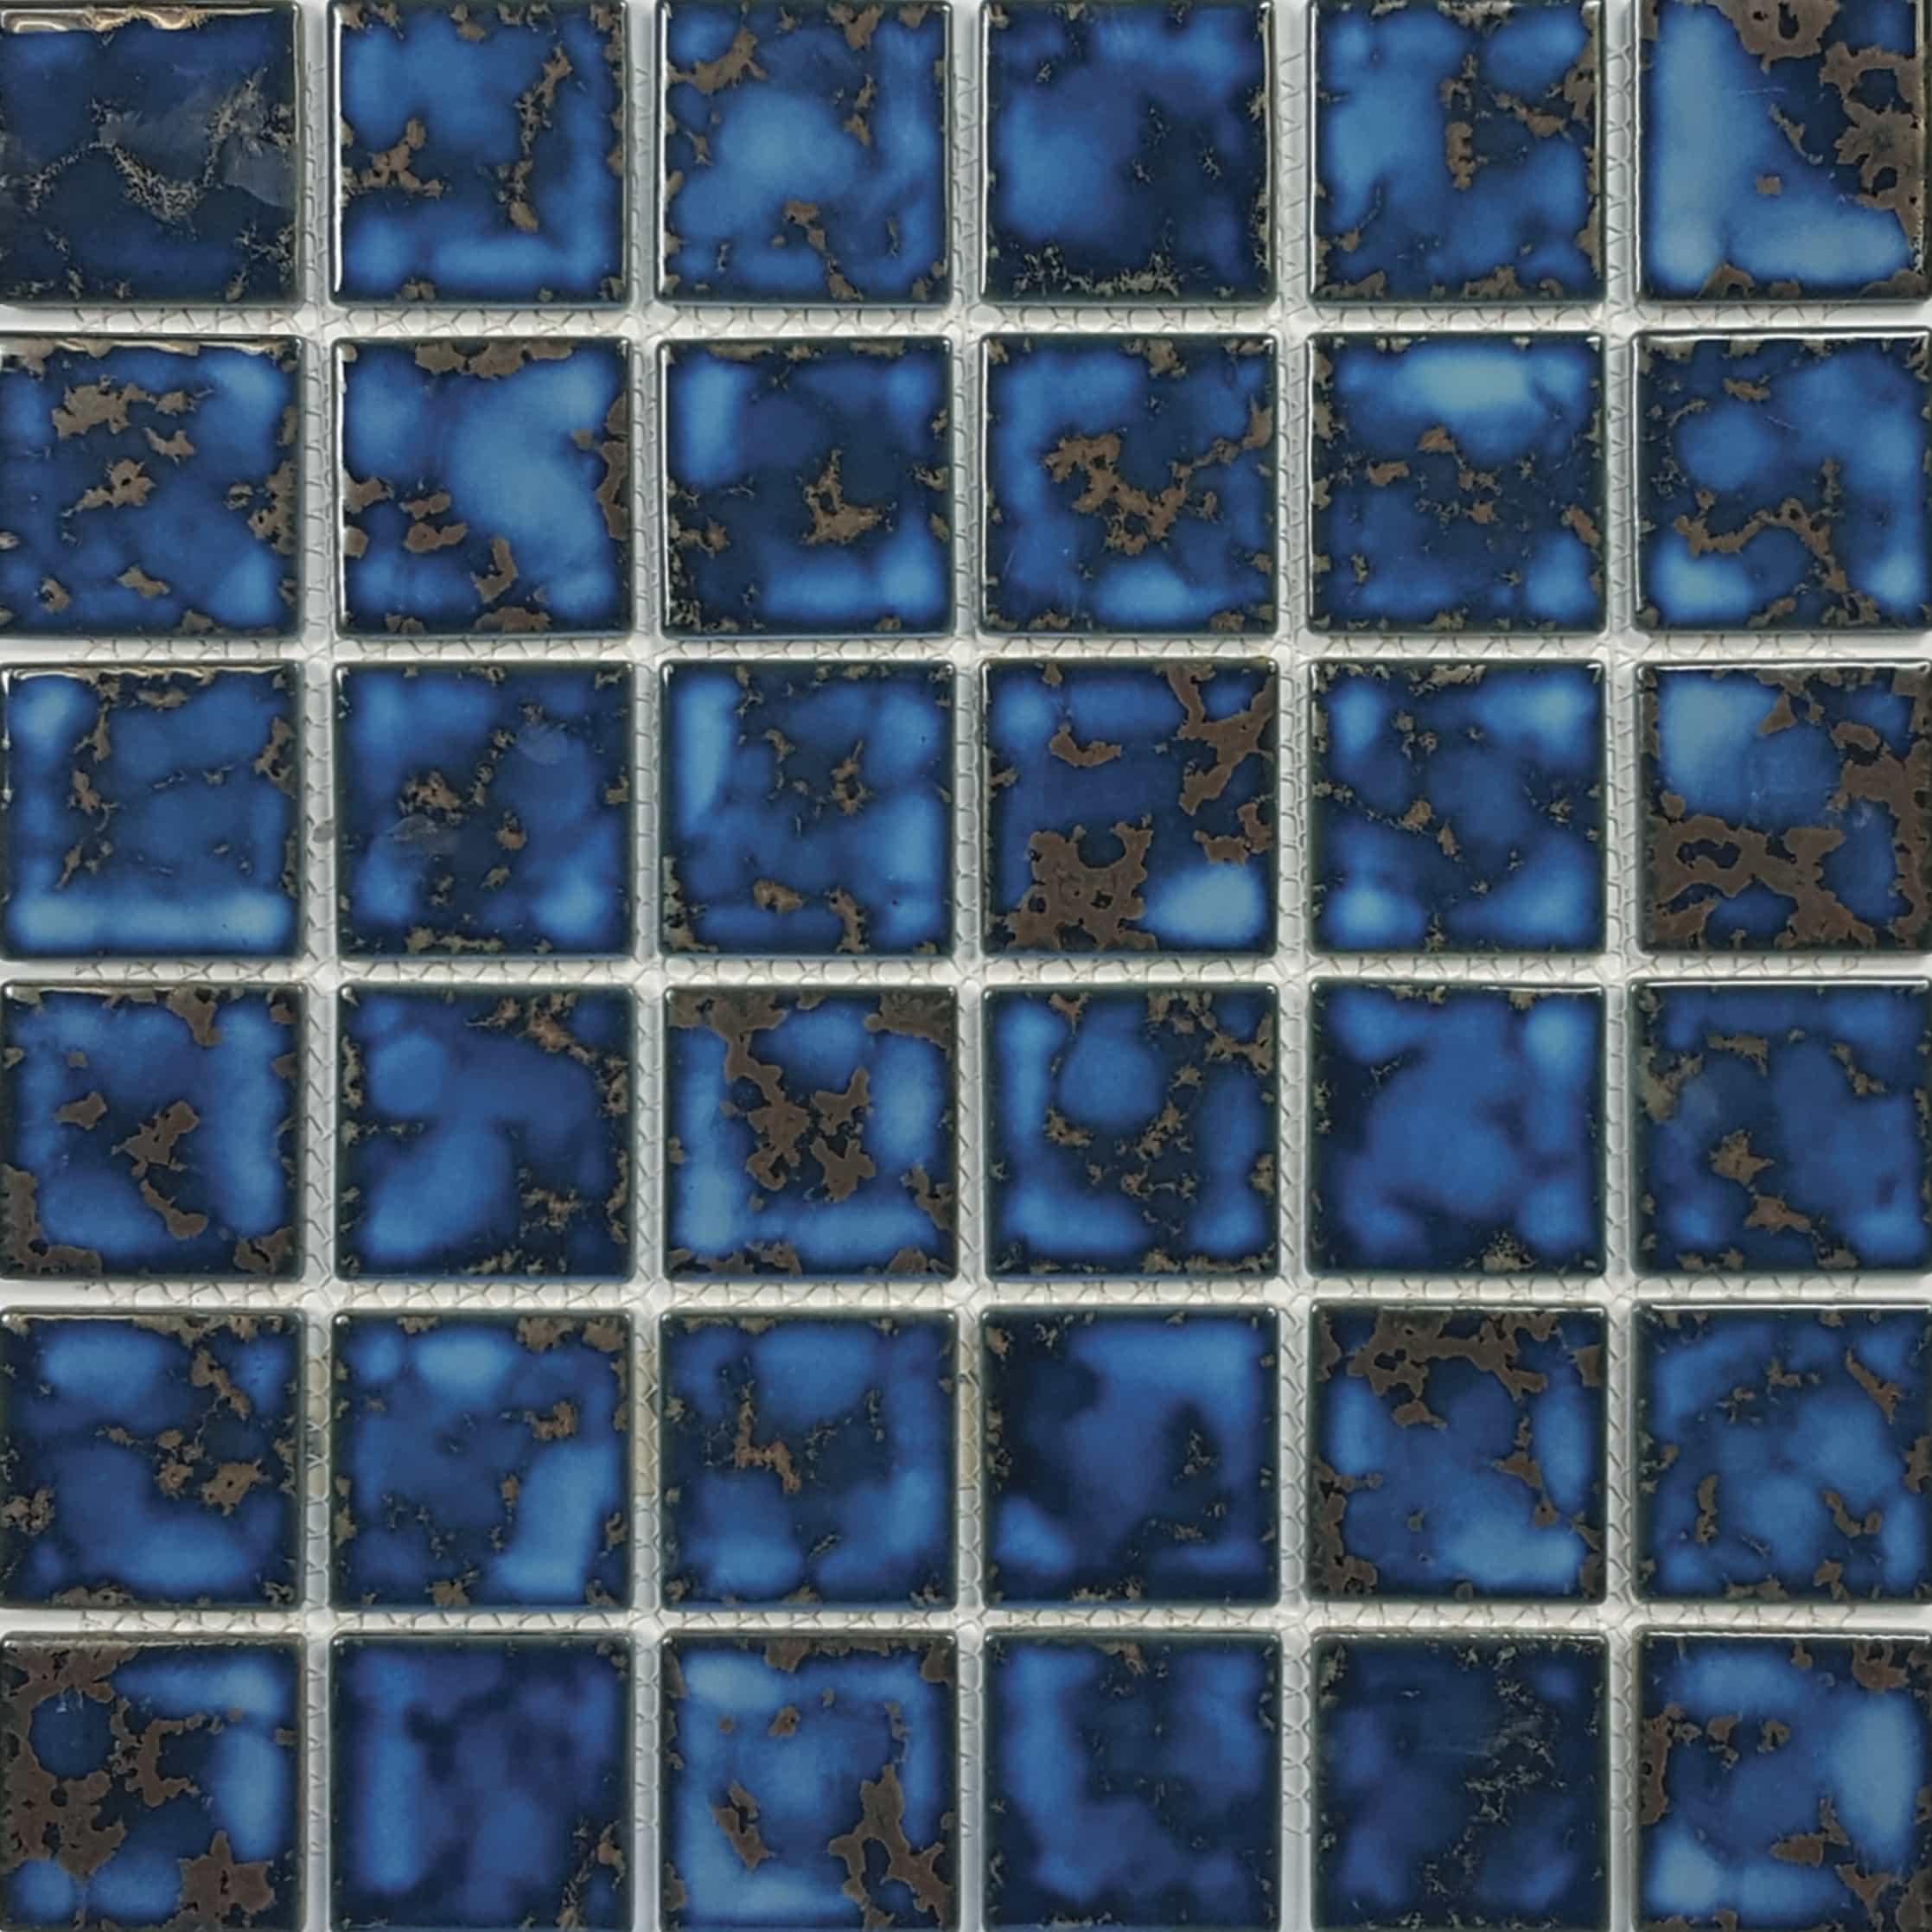 Terra Blue 2″ x 2″ (Harmony Series) Porcelain Pool Tile